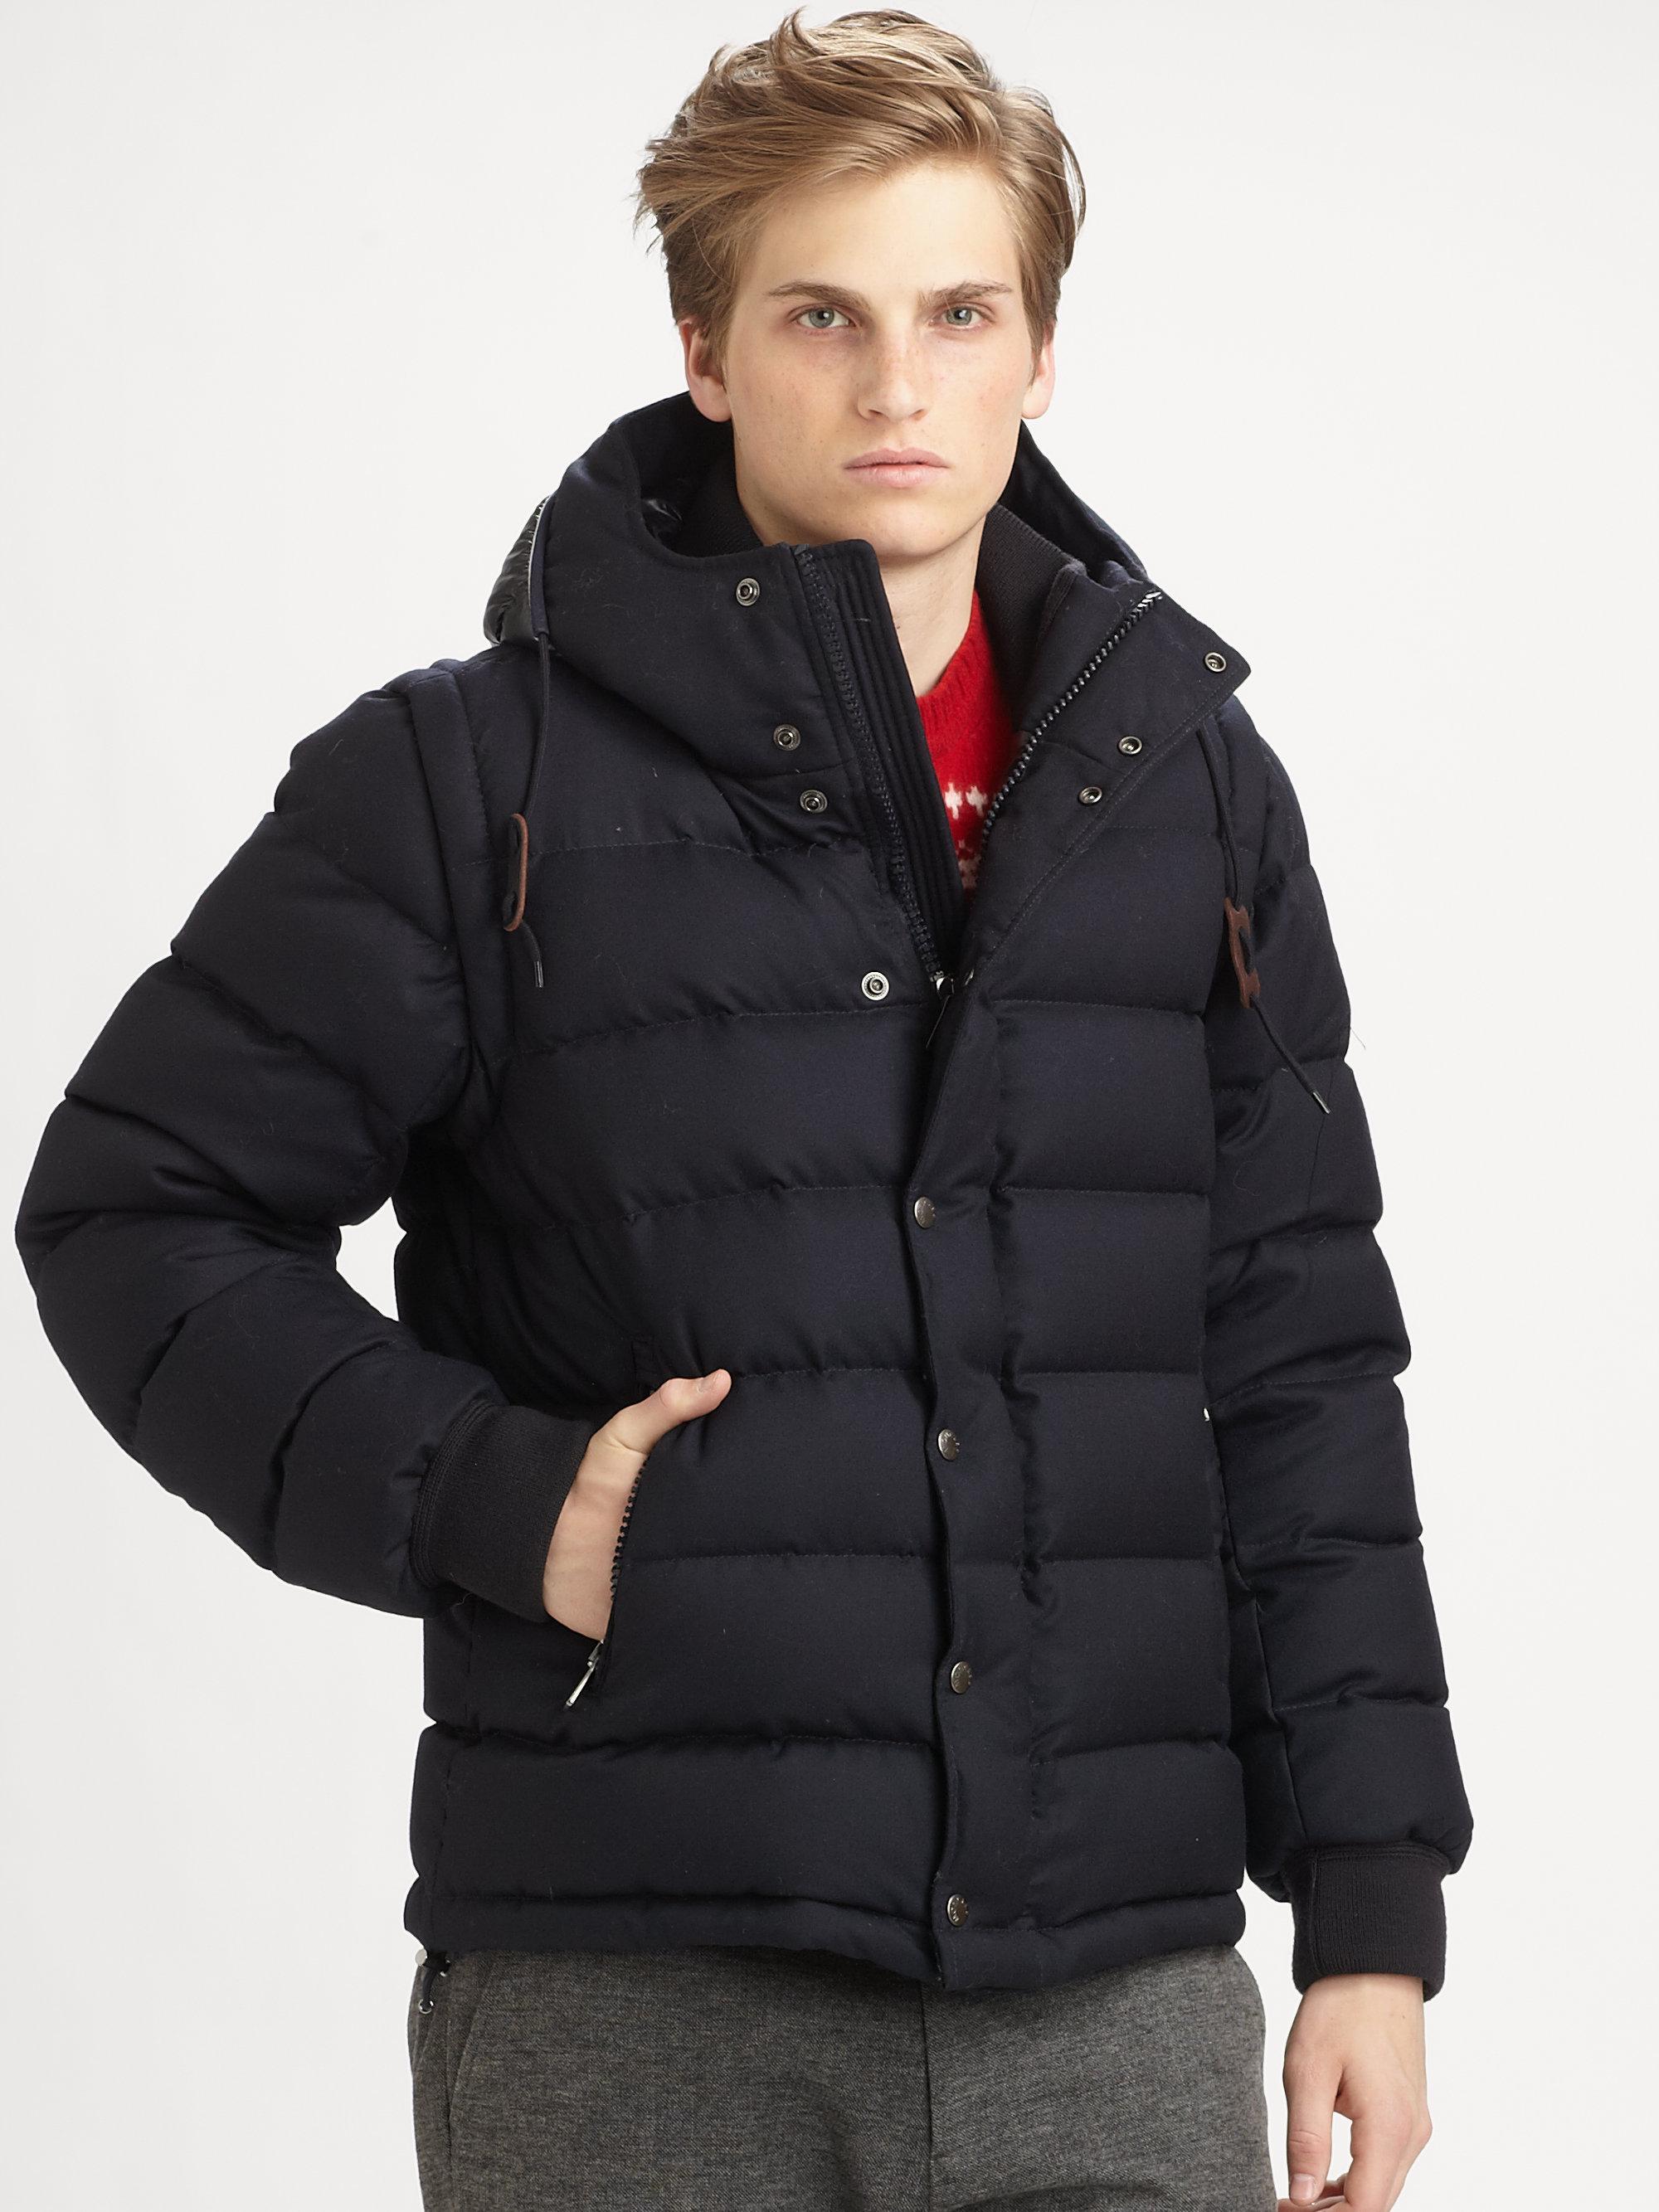 Moncler Hem Hooded Wool Down Jacket for Men | Lyst